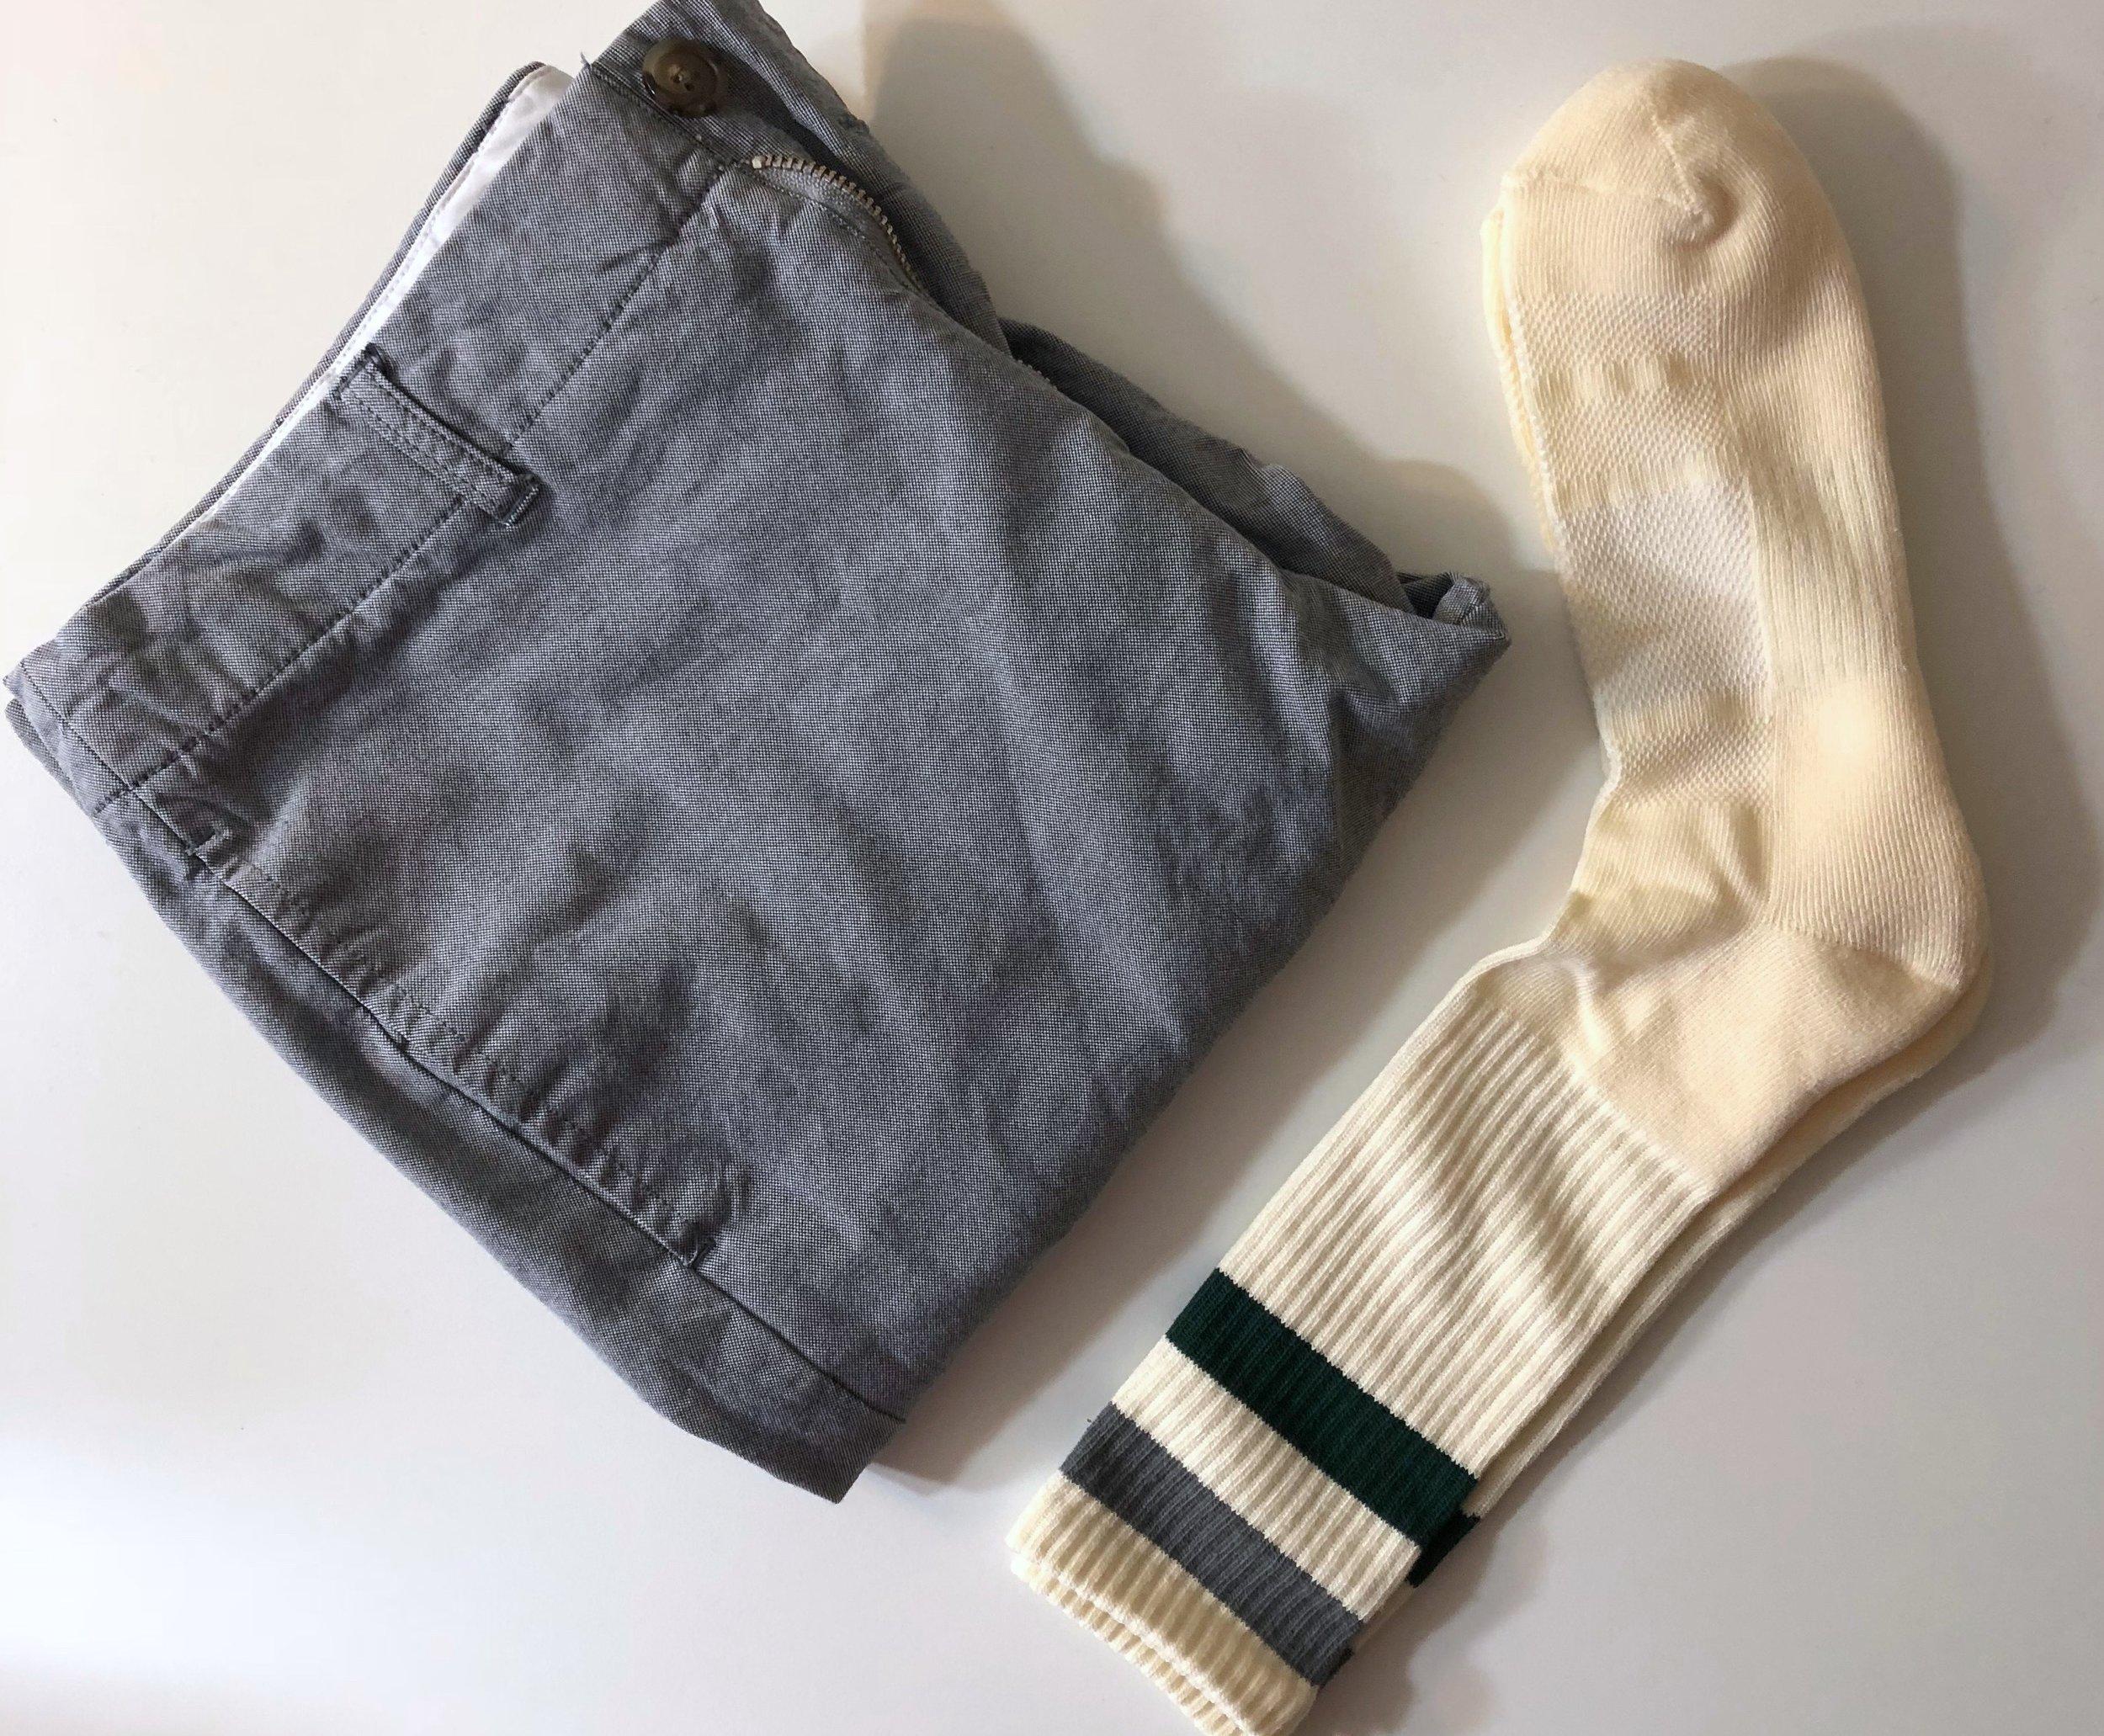 Sock and pants pairing